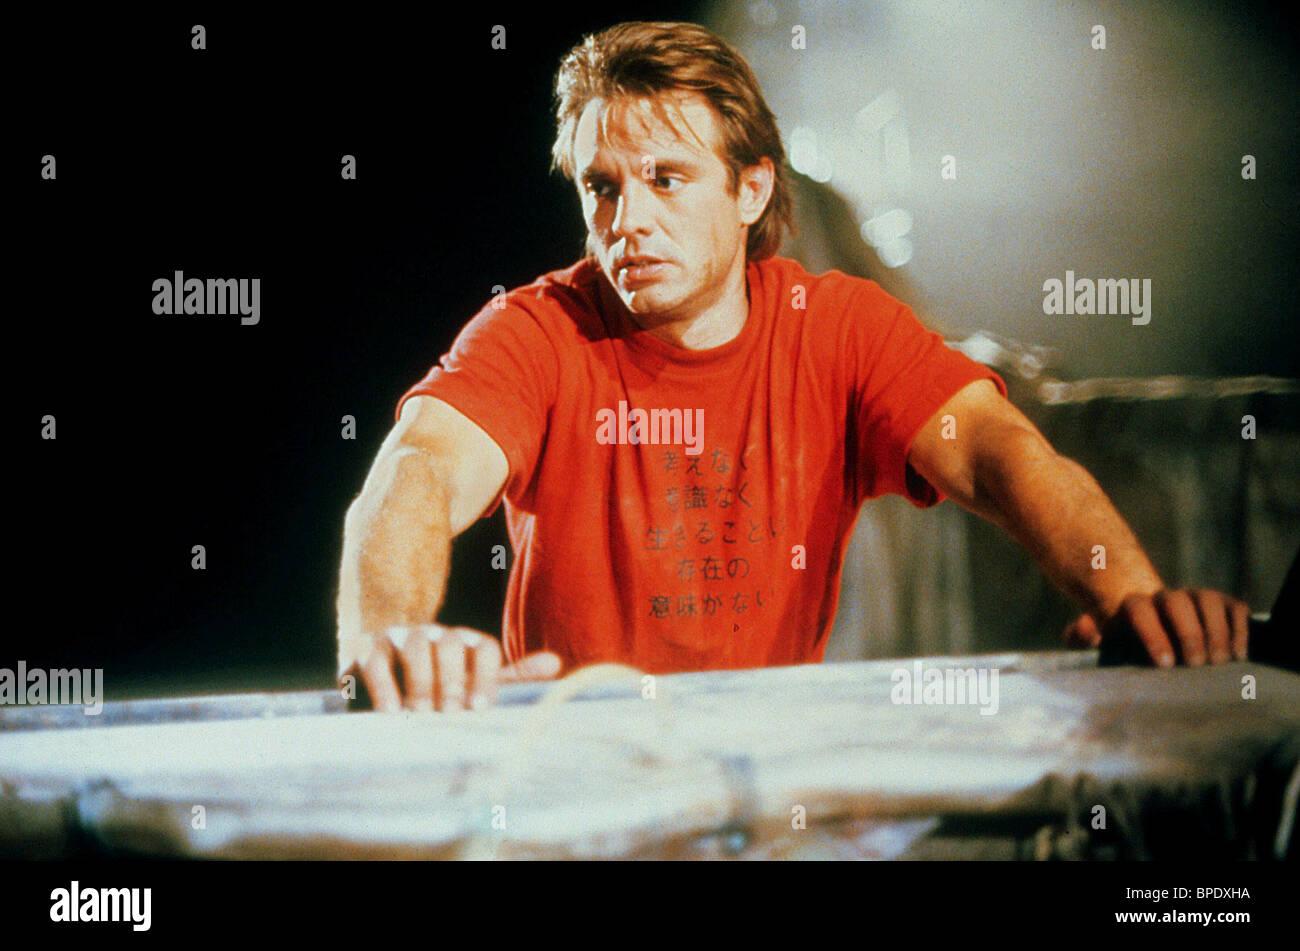 MICHAEL BIEHN TIMEBOMB (1991) - Stock Image